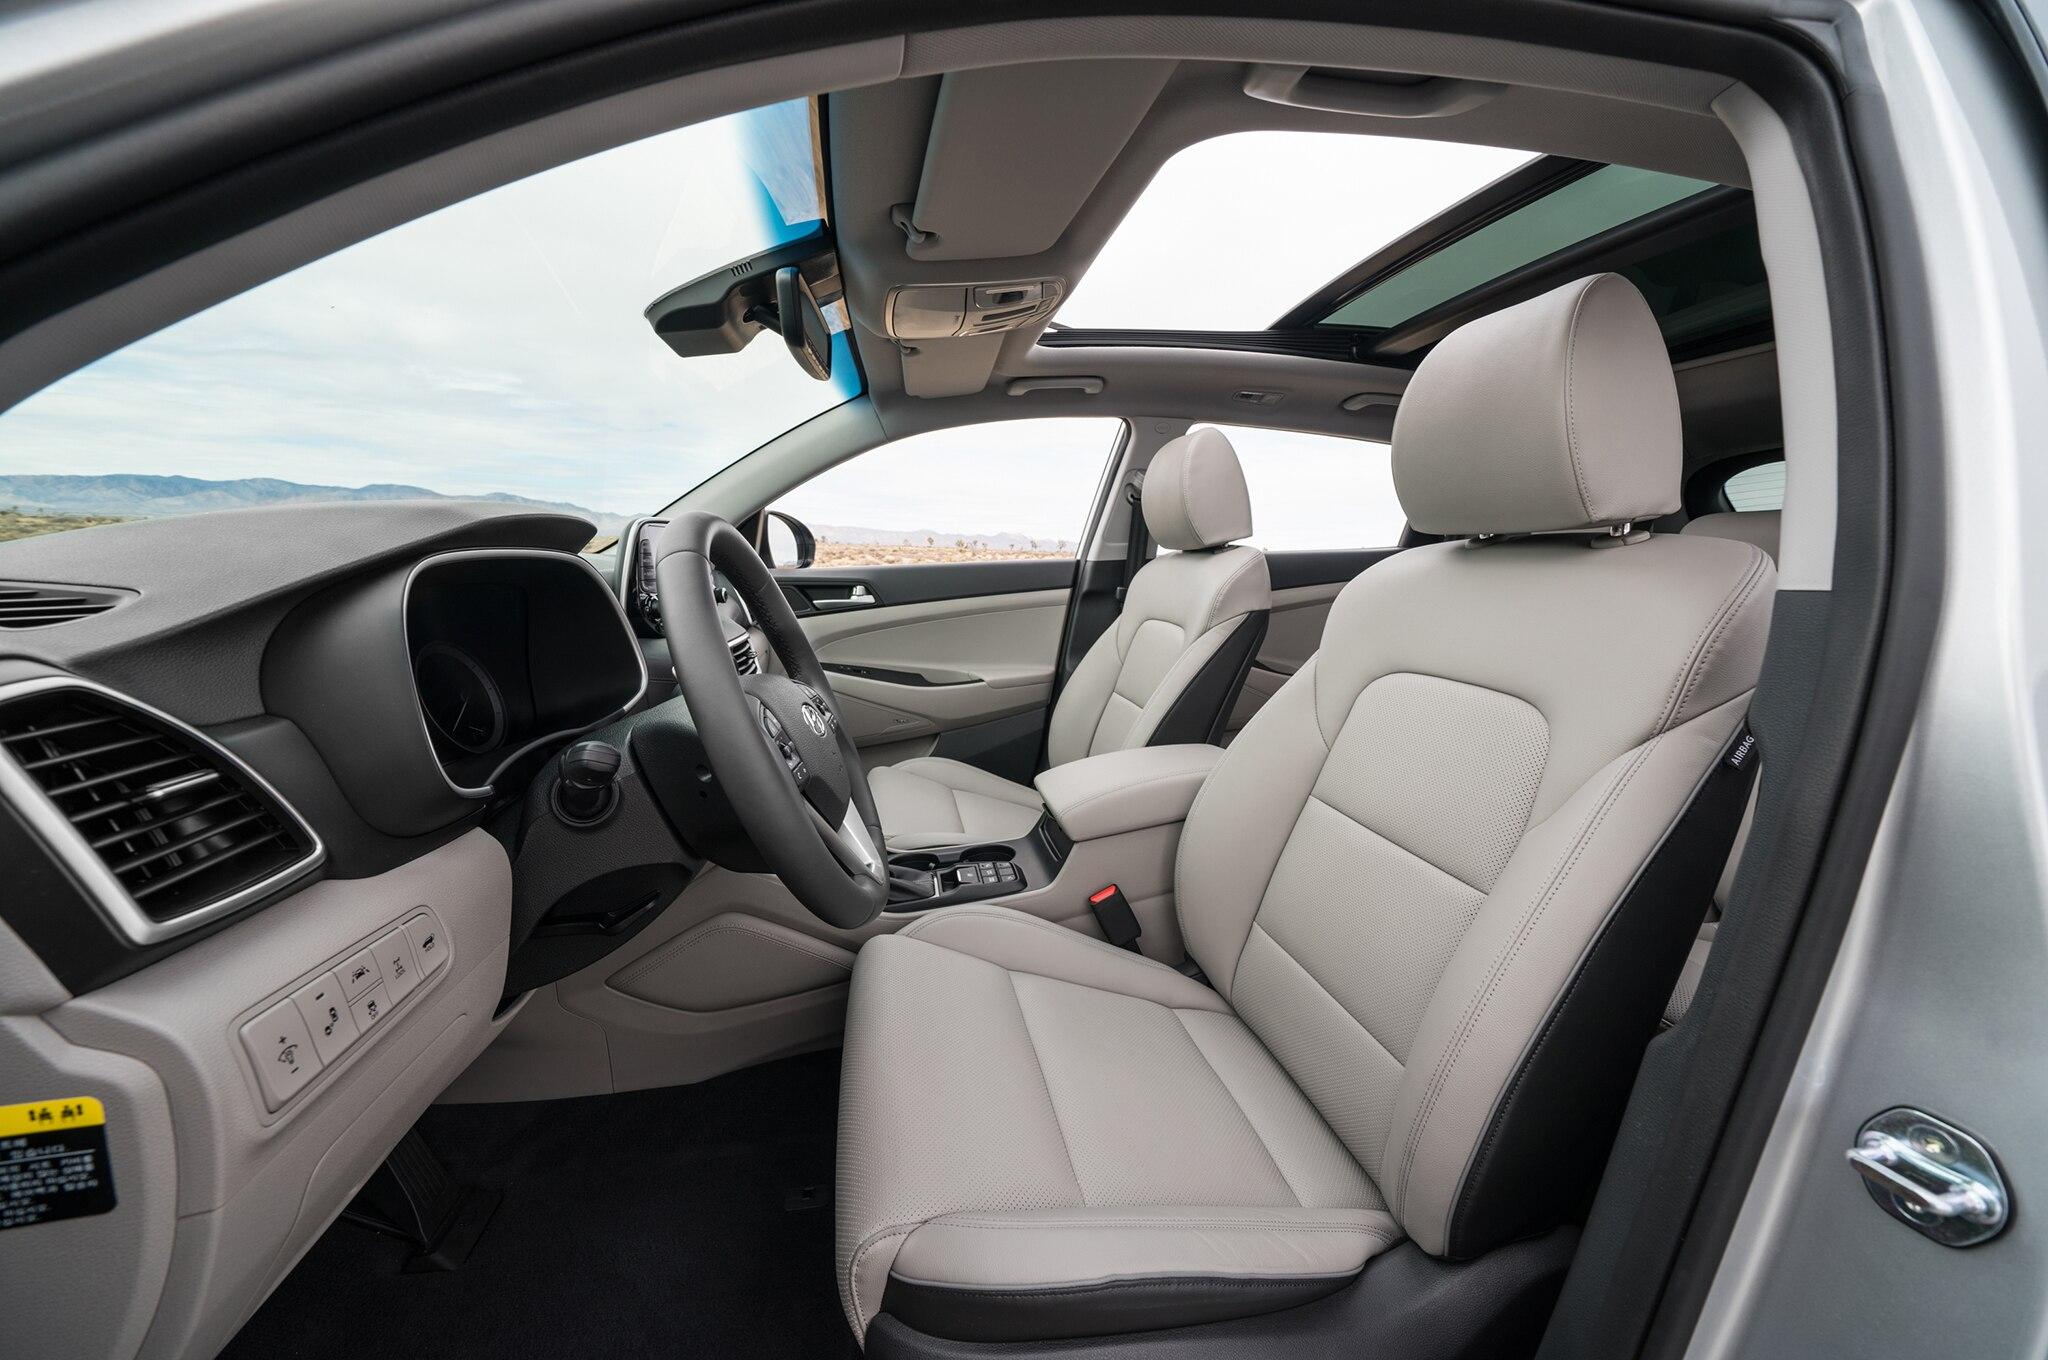 2015 - [Hyundai] Tucson III - Page 8 2019-Hyundai-Tucson-front-interior-seats